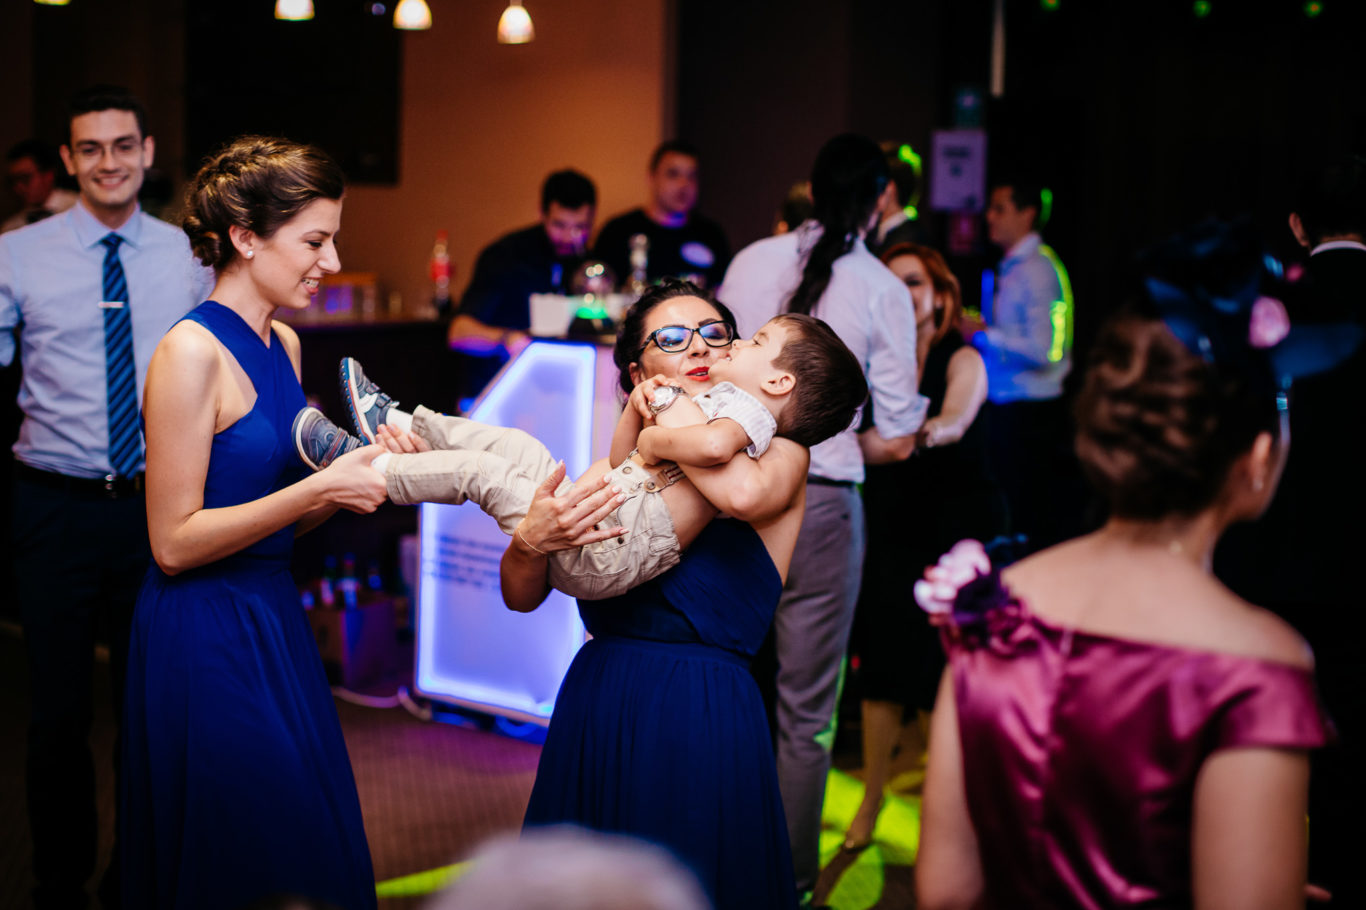 0624-Fotografie-nunta-Bucuresti-Oana-Catalin-fotograf-Ciprian-Dumitrescu-CDF_1103